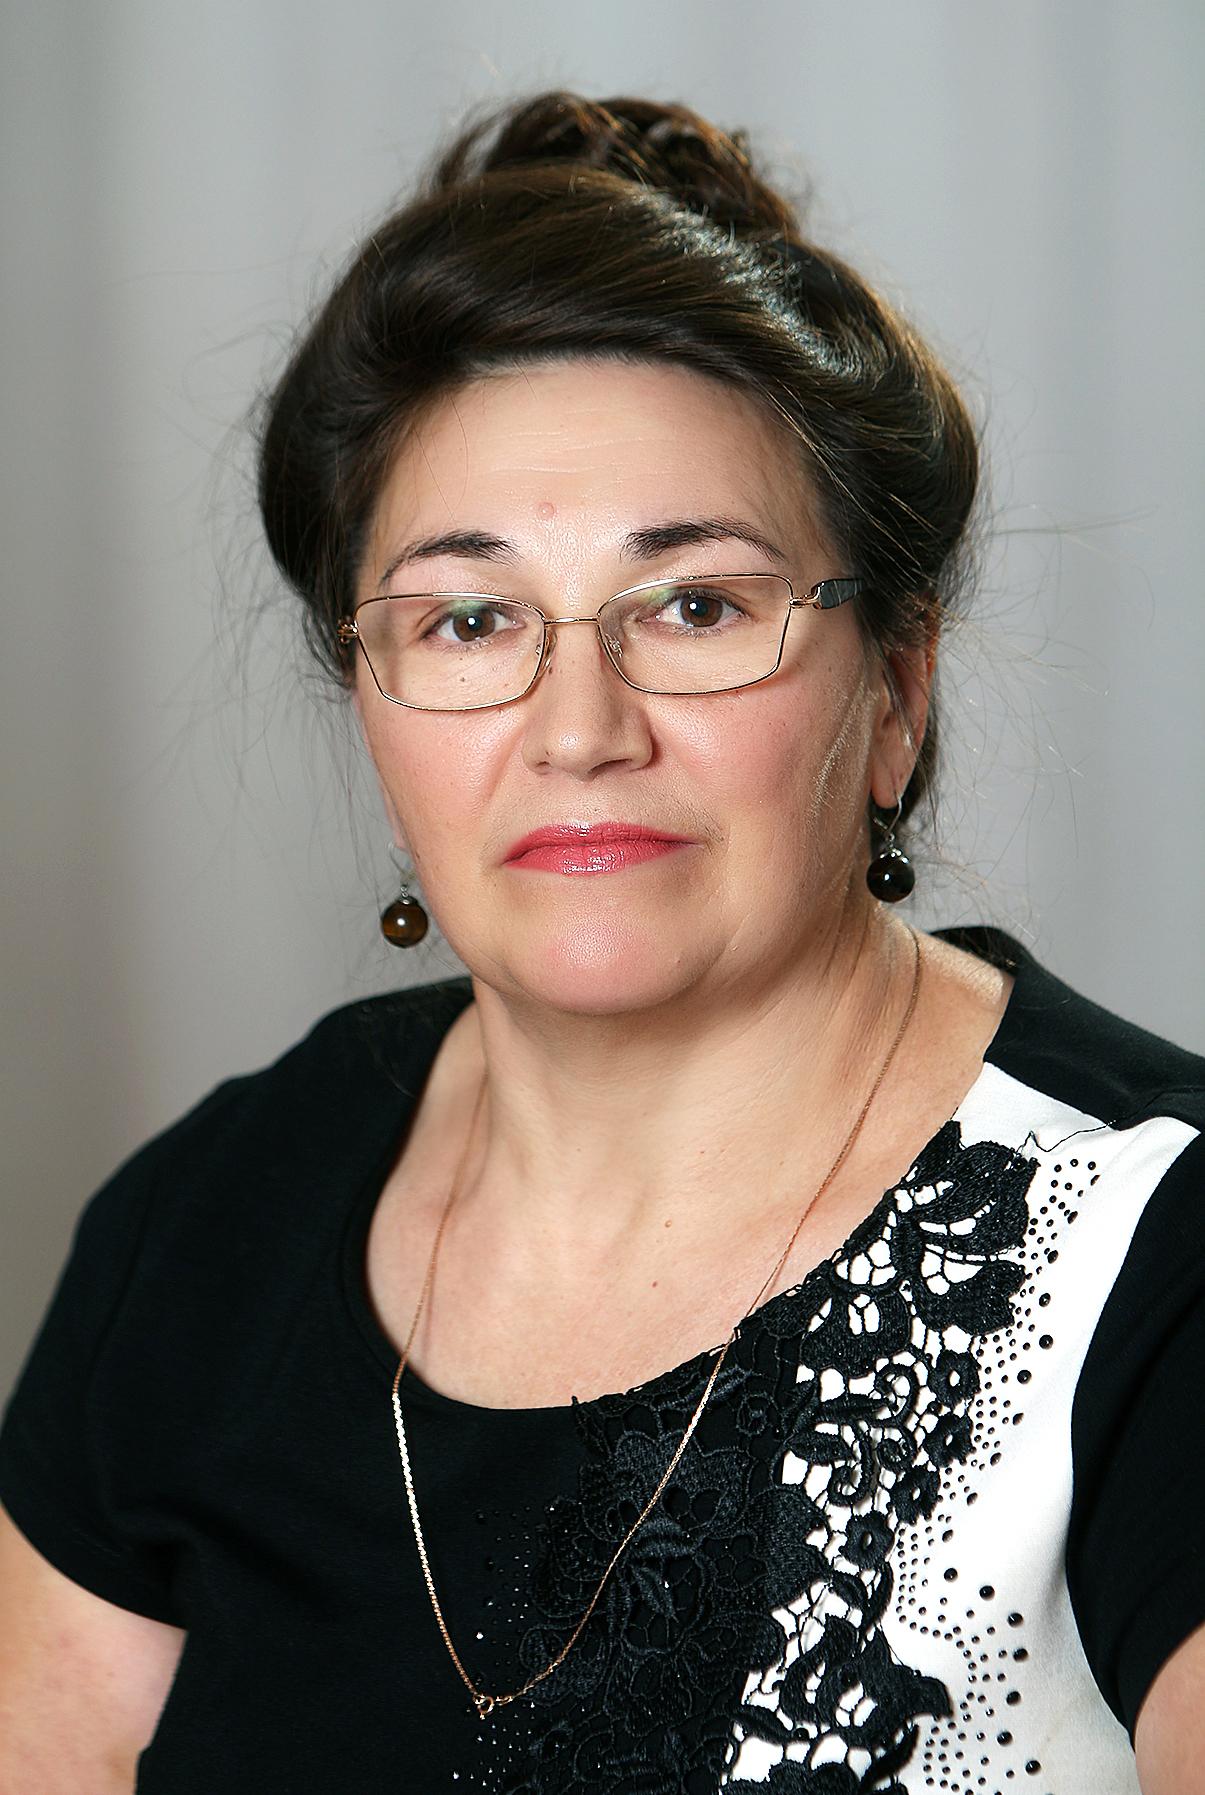 Бадгутдинова Назибя Хамзиевна